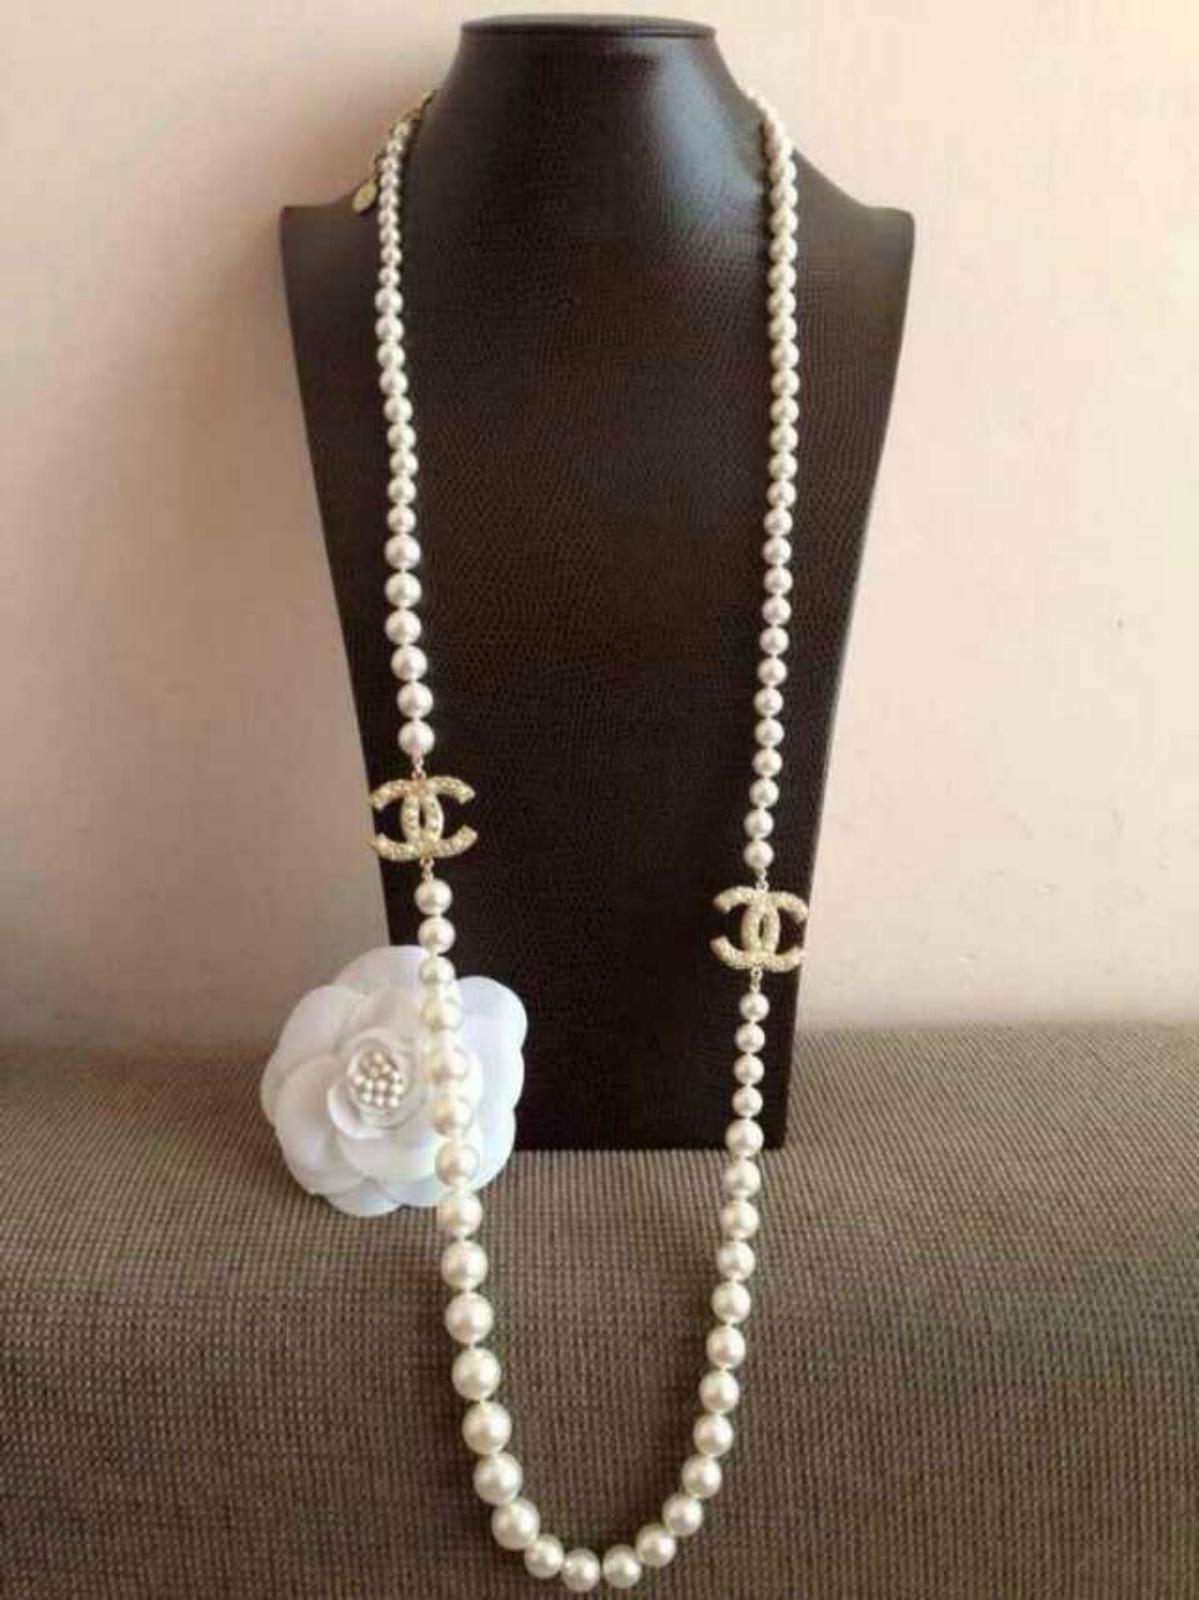 Authentic Chanel 100th Anniversary 2 Cc Faux Pearl Gold Necklace Rare